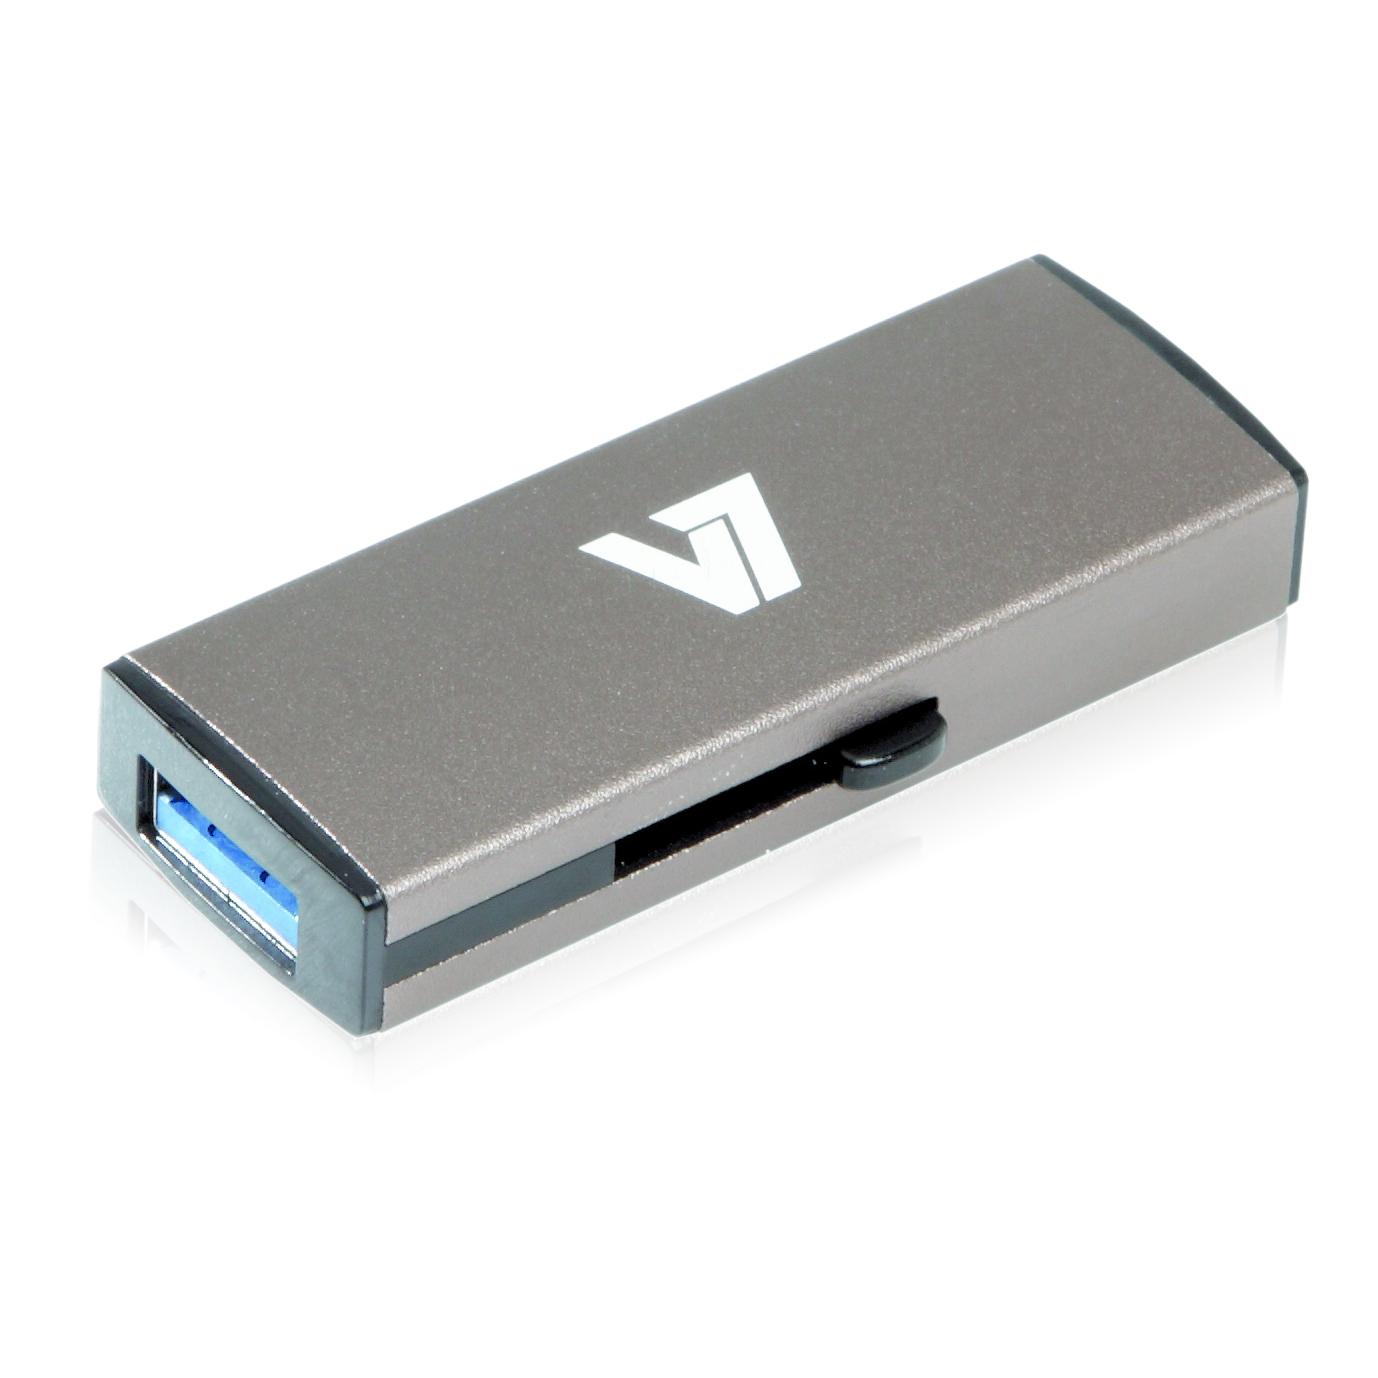 V7 VU332GDR-GRY-2E - USB-Flash-Laufwerk - 32 GB